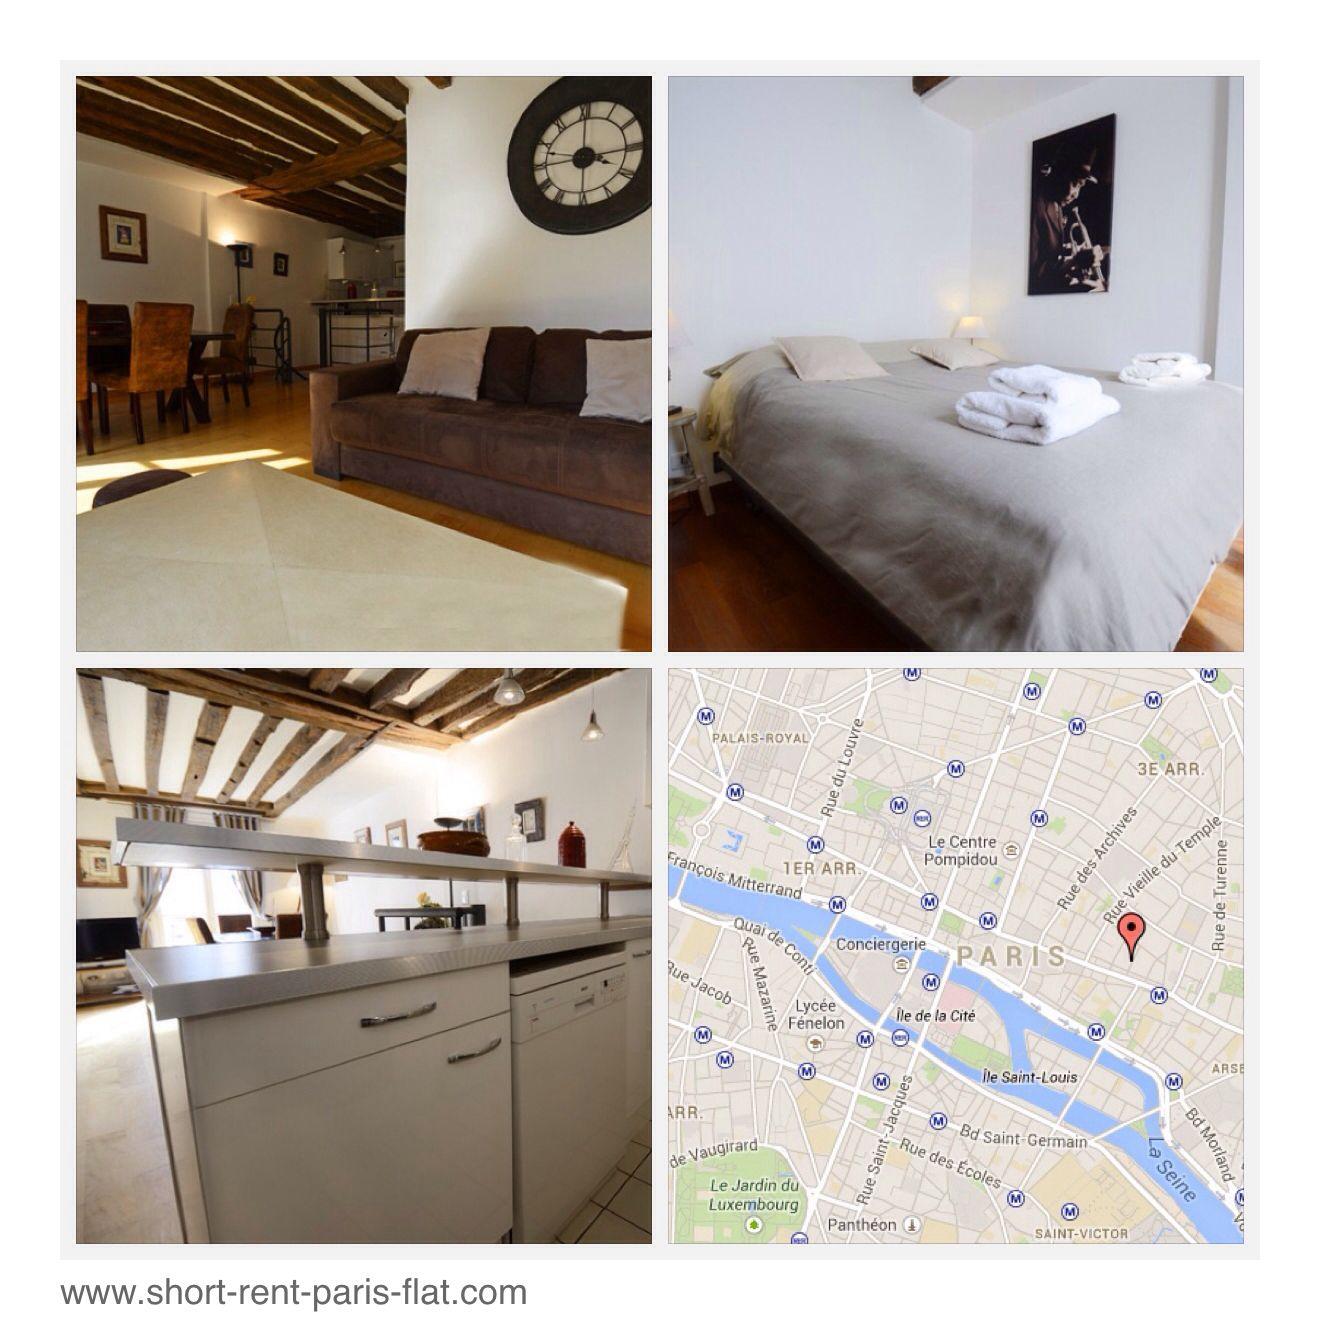 Explore 2 Bedroom Apartments, Ferdinand, And More!